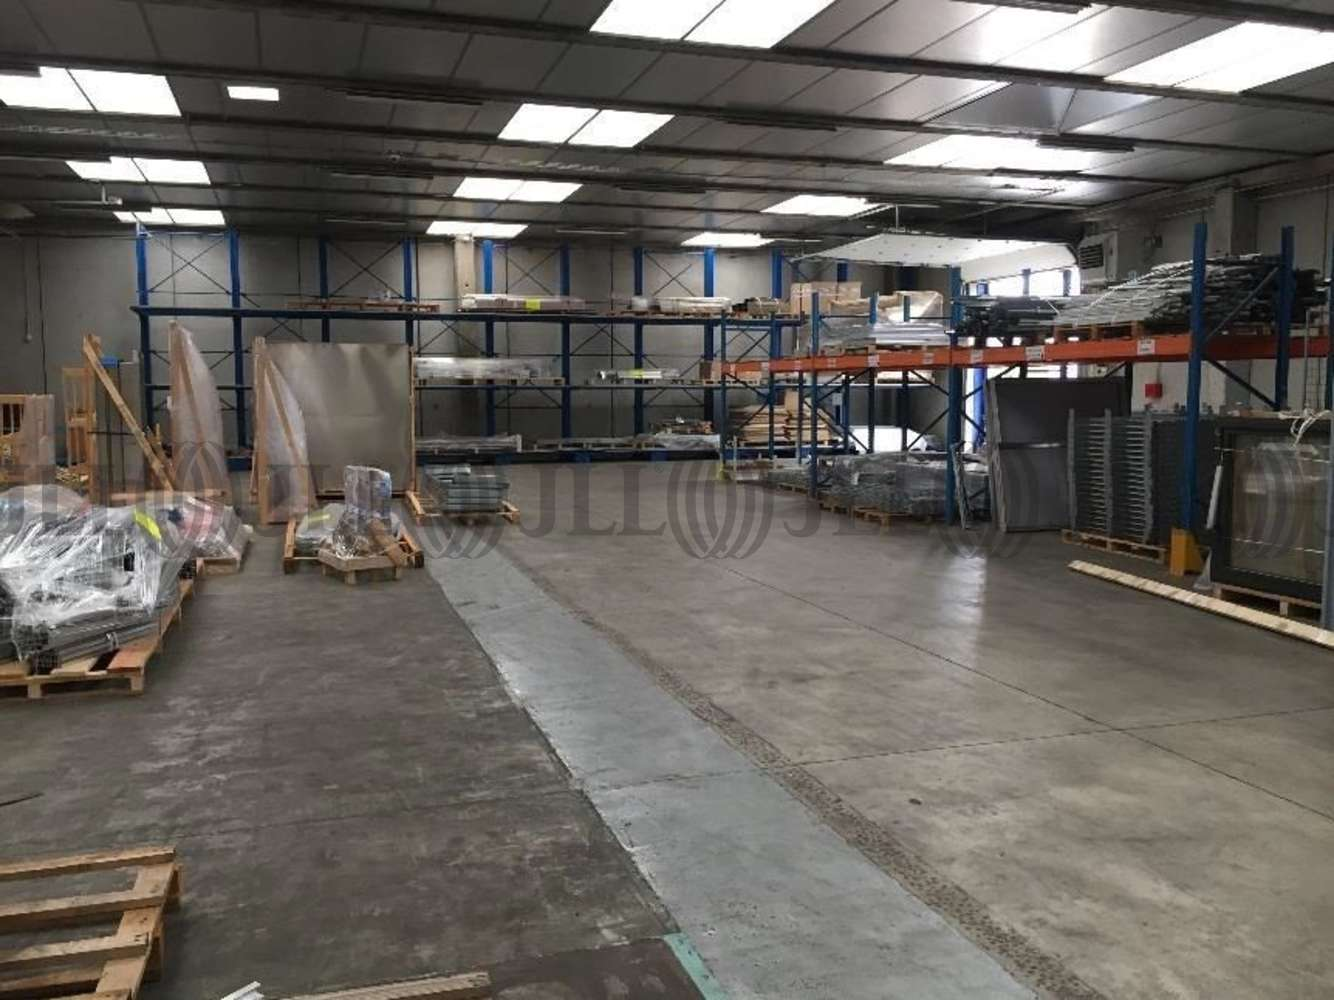 Activités/entrepôt Chaponnay, 69970 - BÂTIMENT MIXTE LYON SUD - CHAPONNAY - 9531901